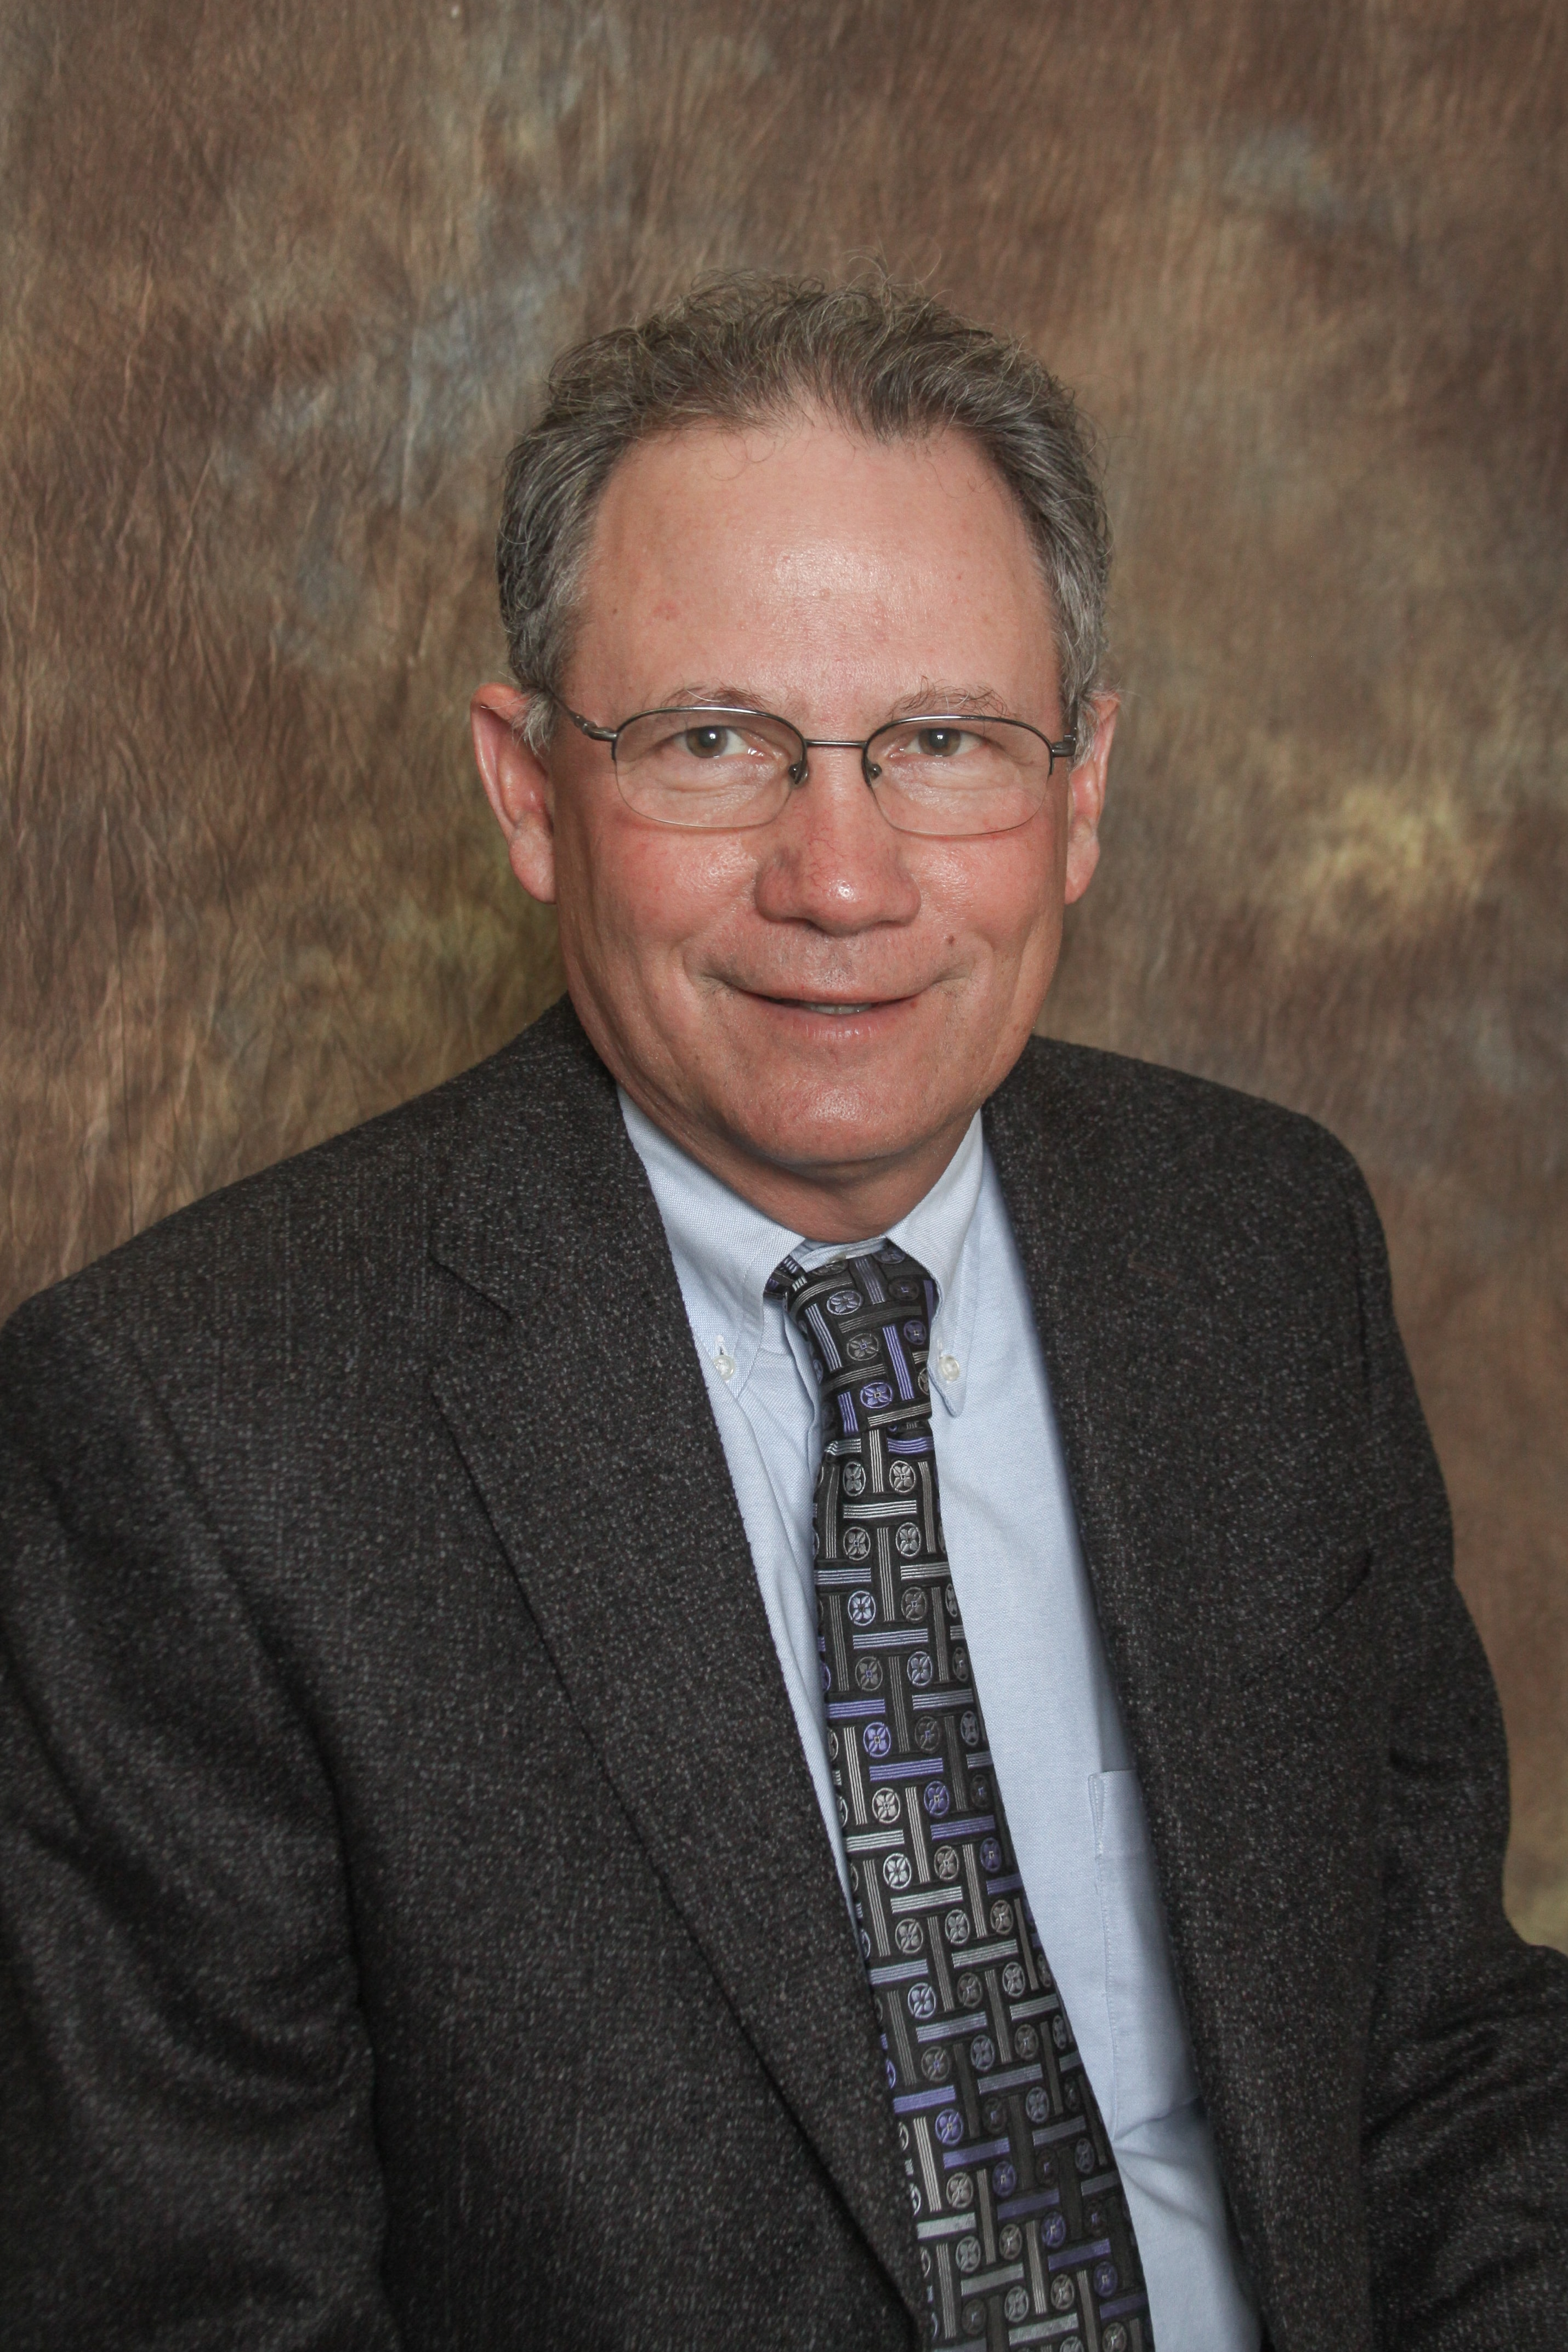 John Swanson, President of Swanson Pickle Company of Ravenna